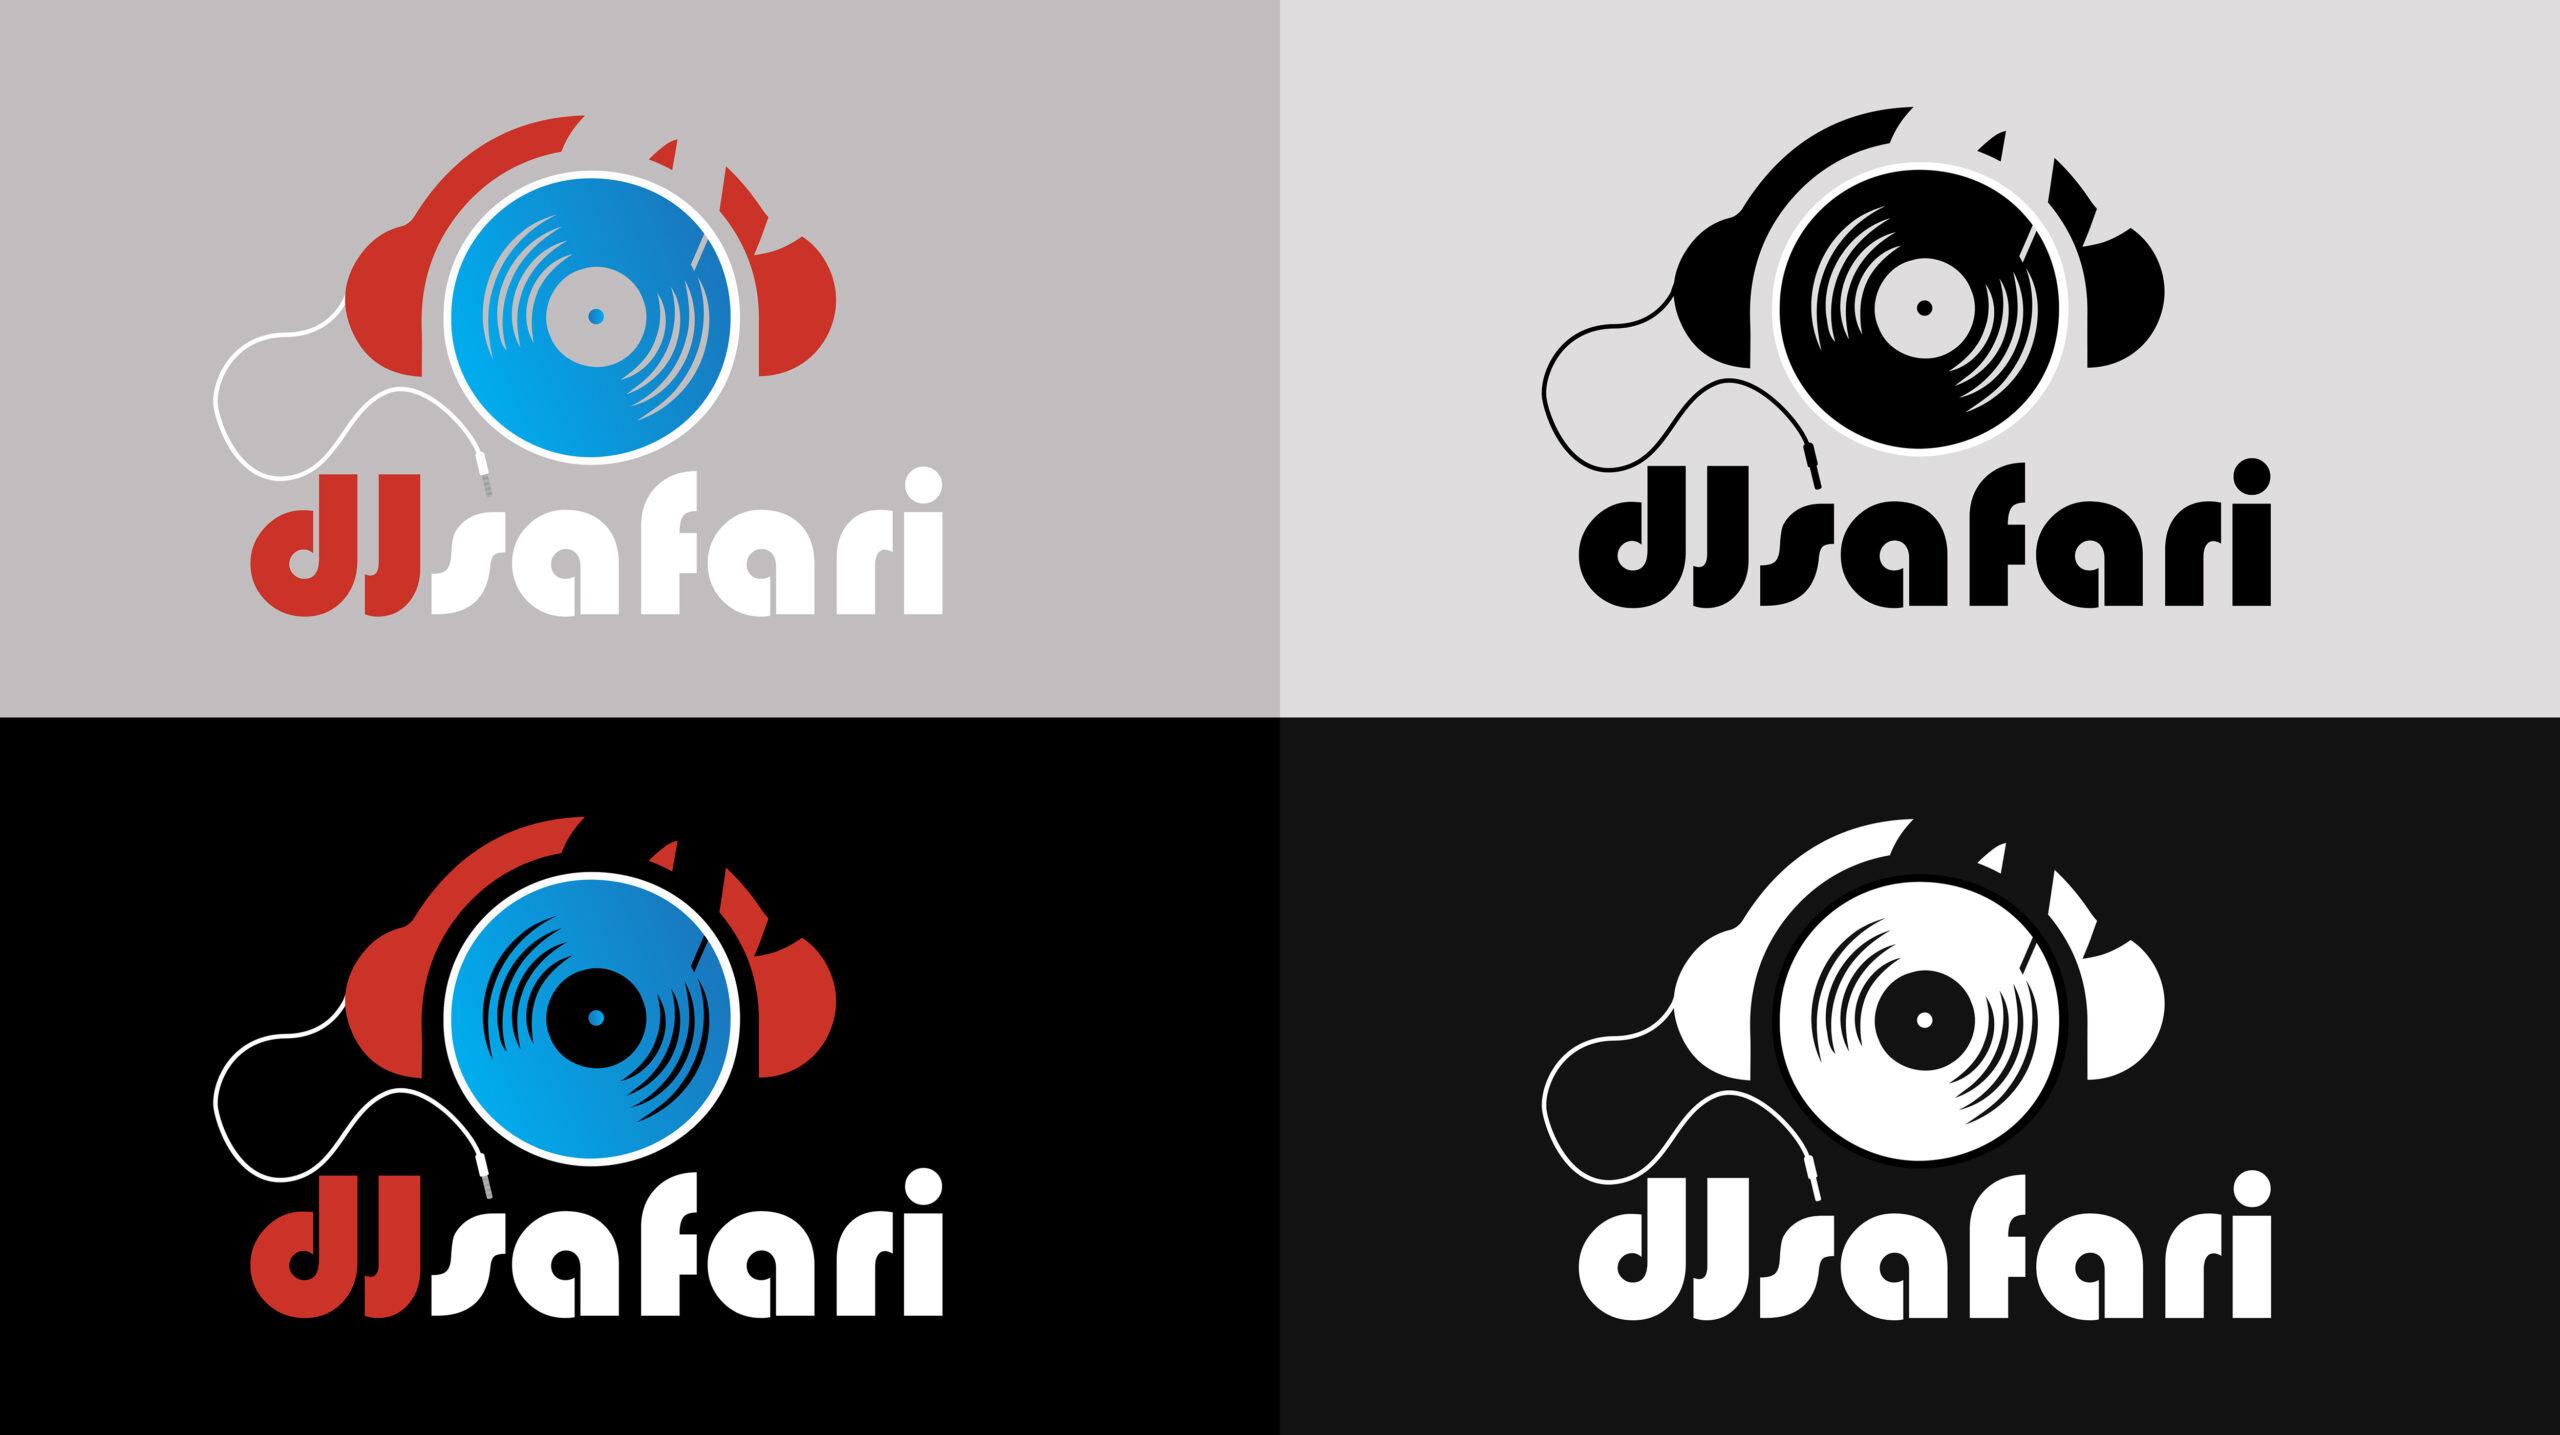 dj-safari-logo-variants